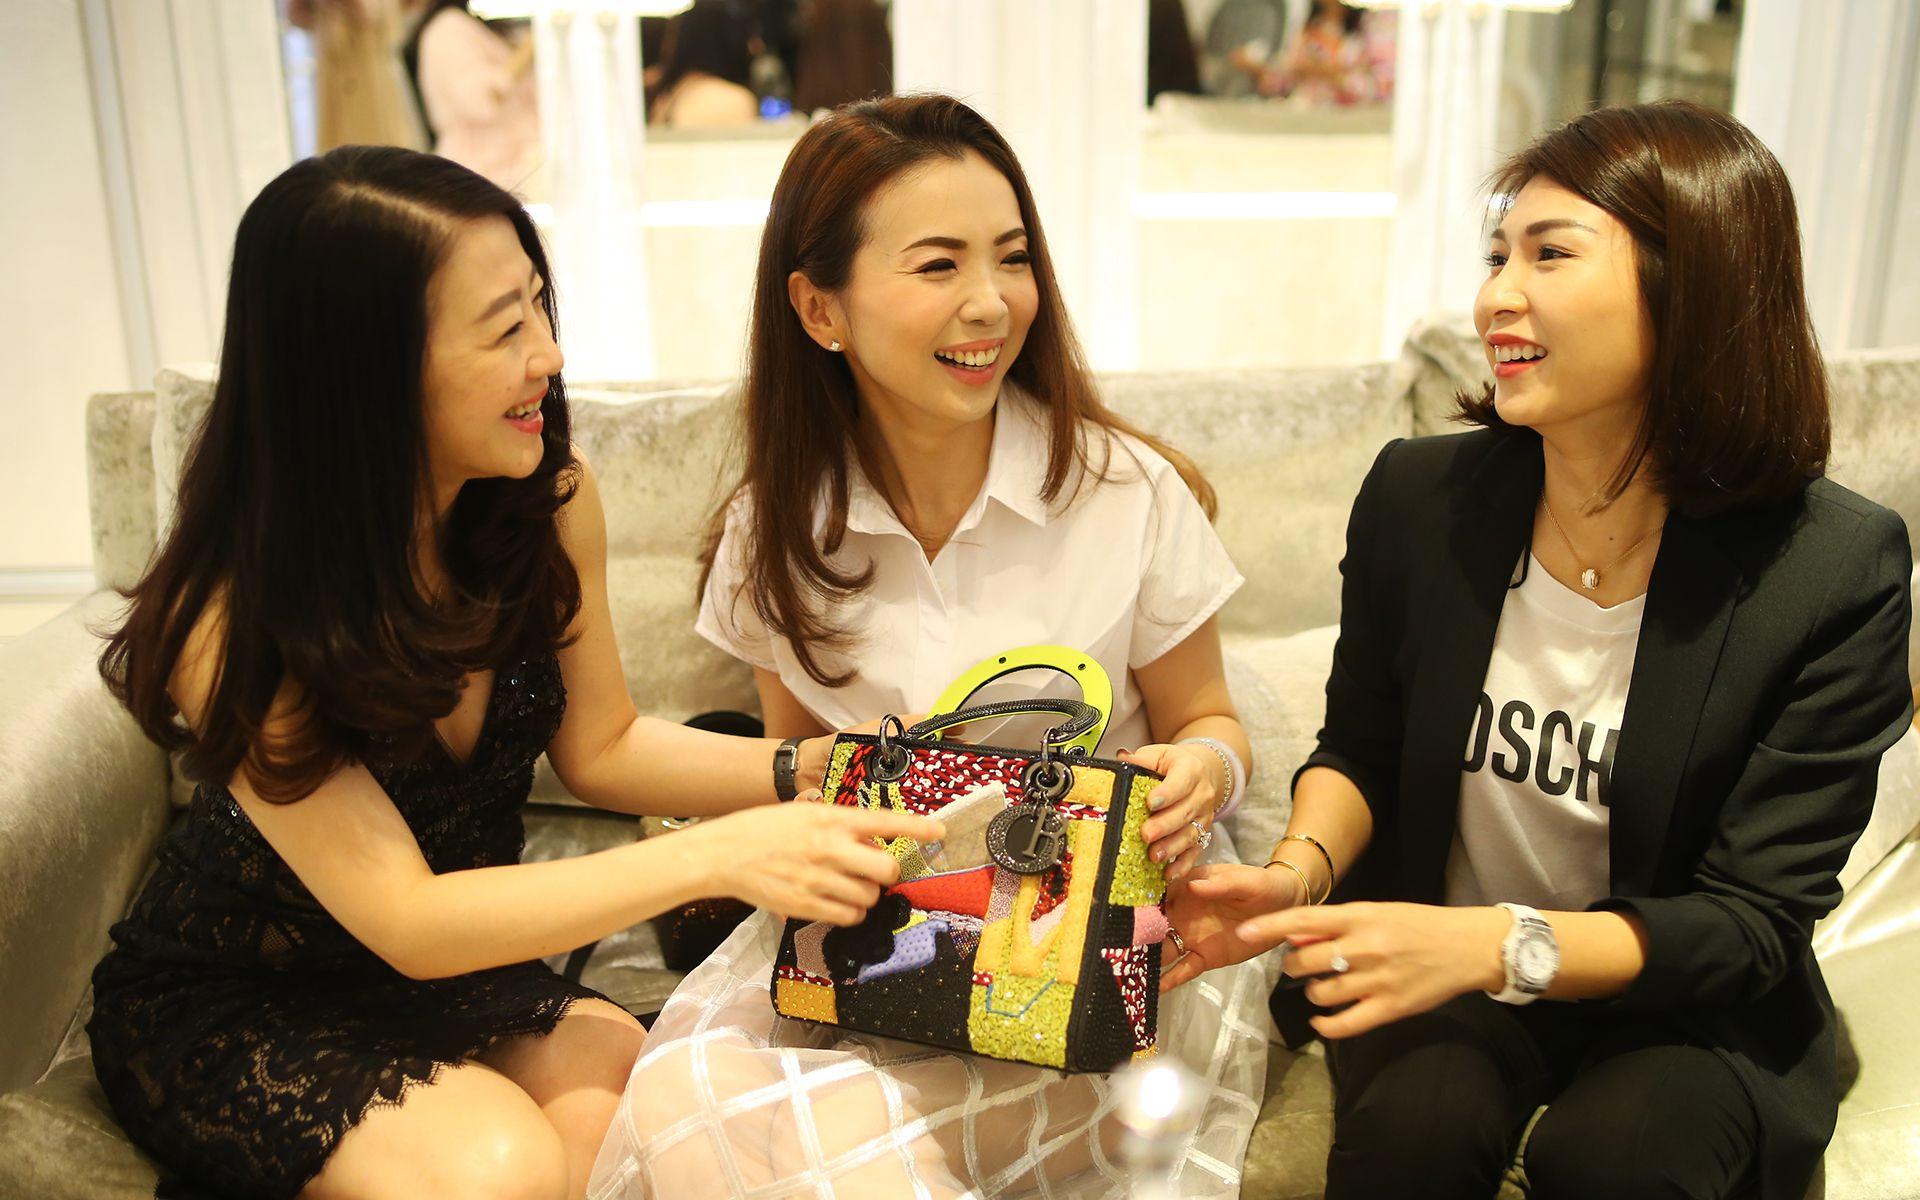 Christine Cheah, Pauline Gan and Datin Kelly Lau